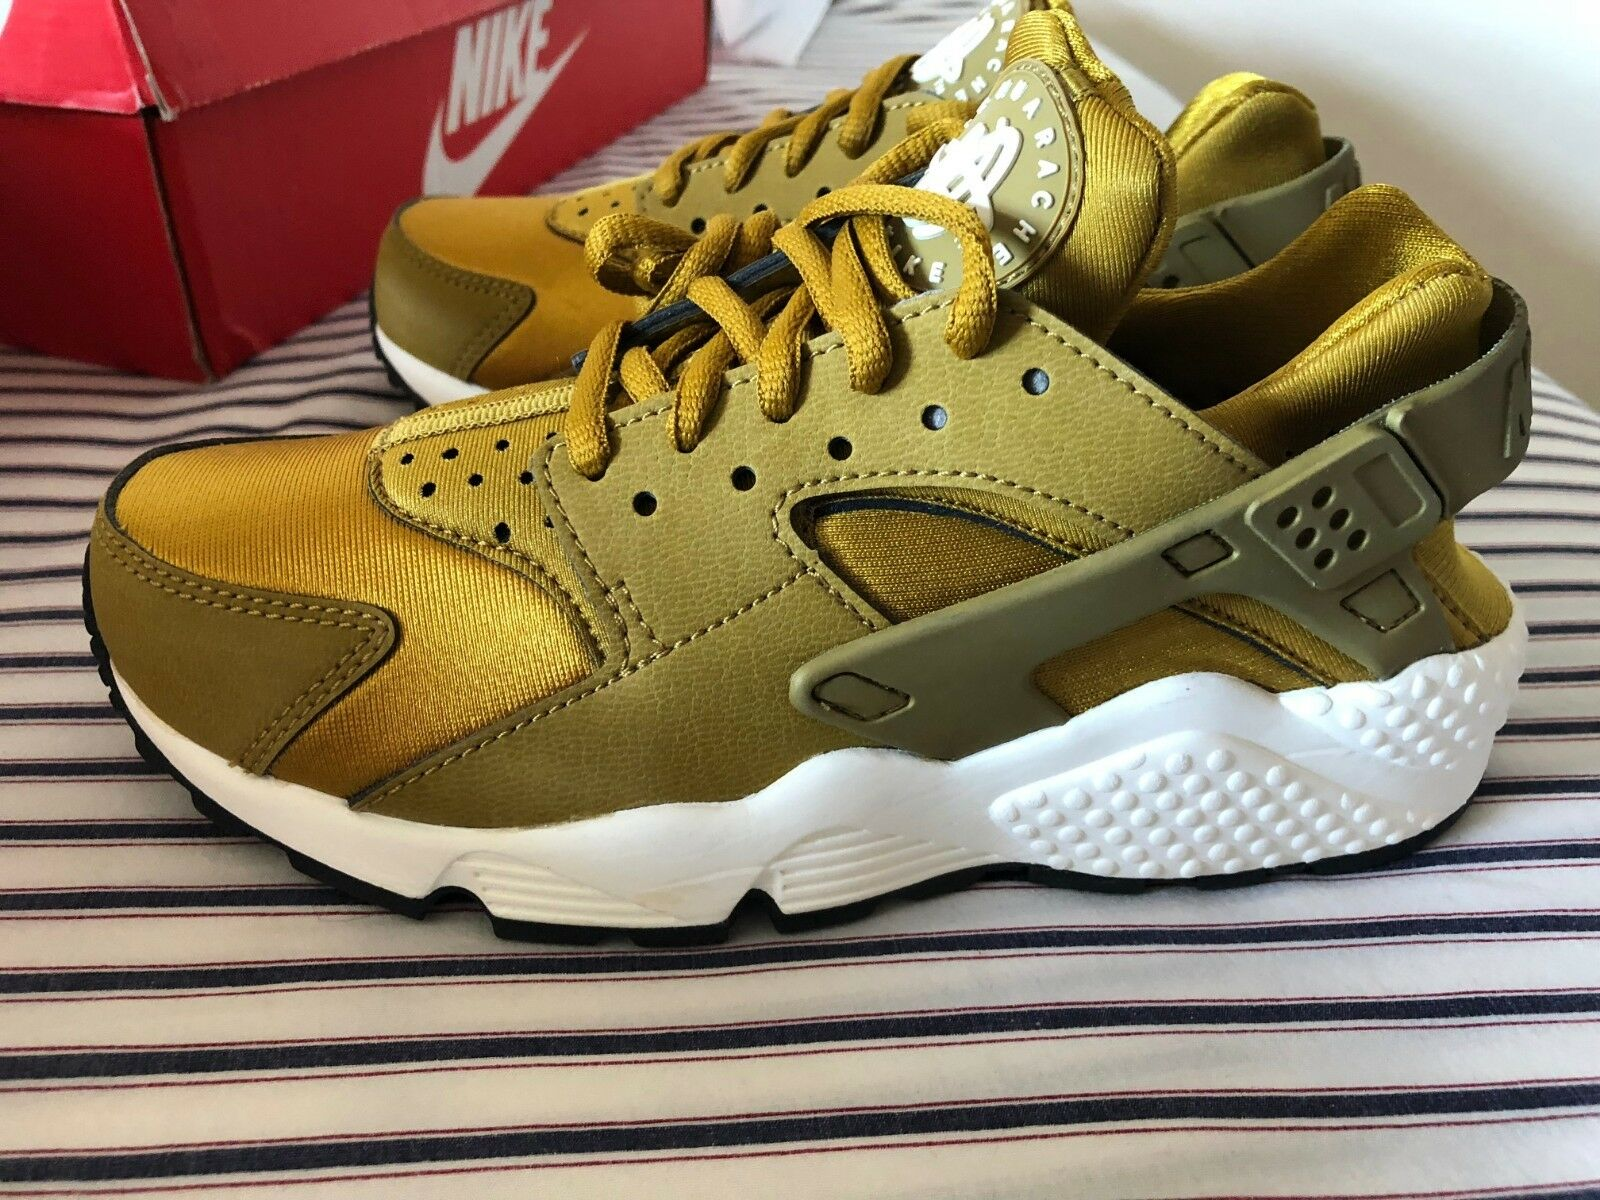 Nike Womens Air Huarache Run Bronzine gold 634835-700 sz 5.5 8